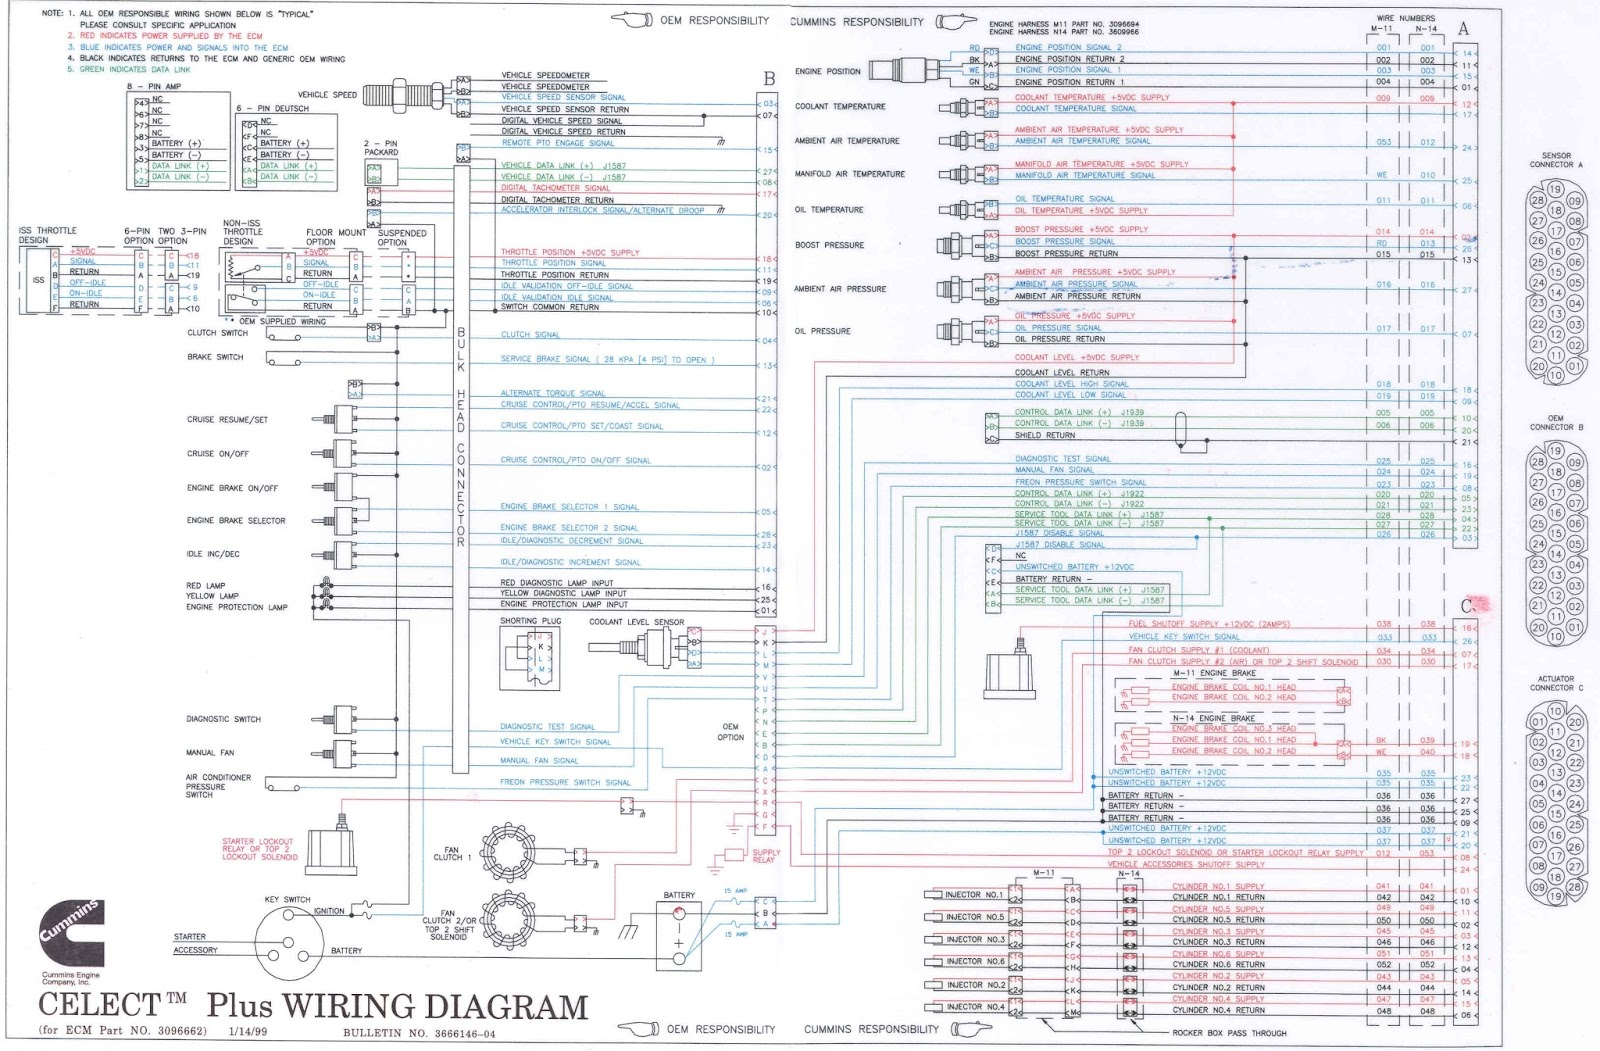 celect plus wiring diagram wiring diagram datasource m 11 ecm wiring diagram manual e book m11 [ 1600 x 1051 Pixel ]